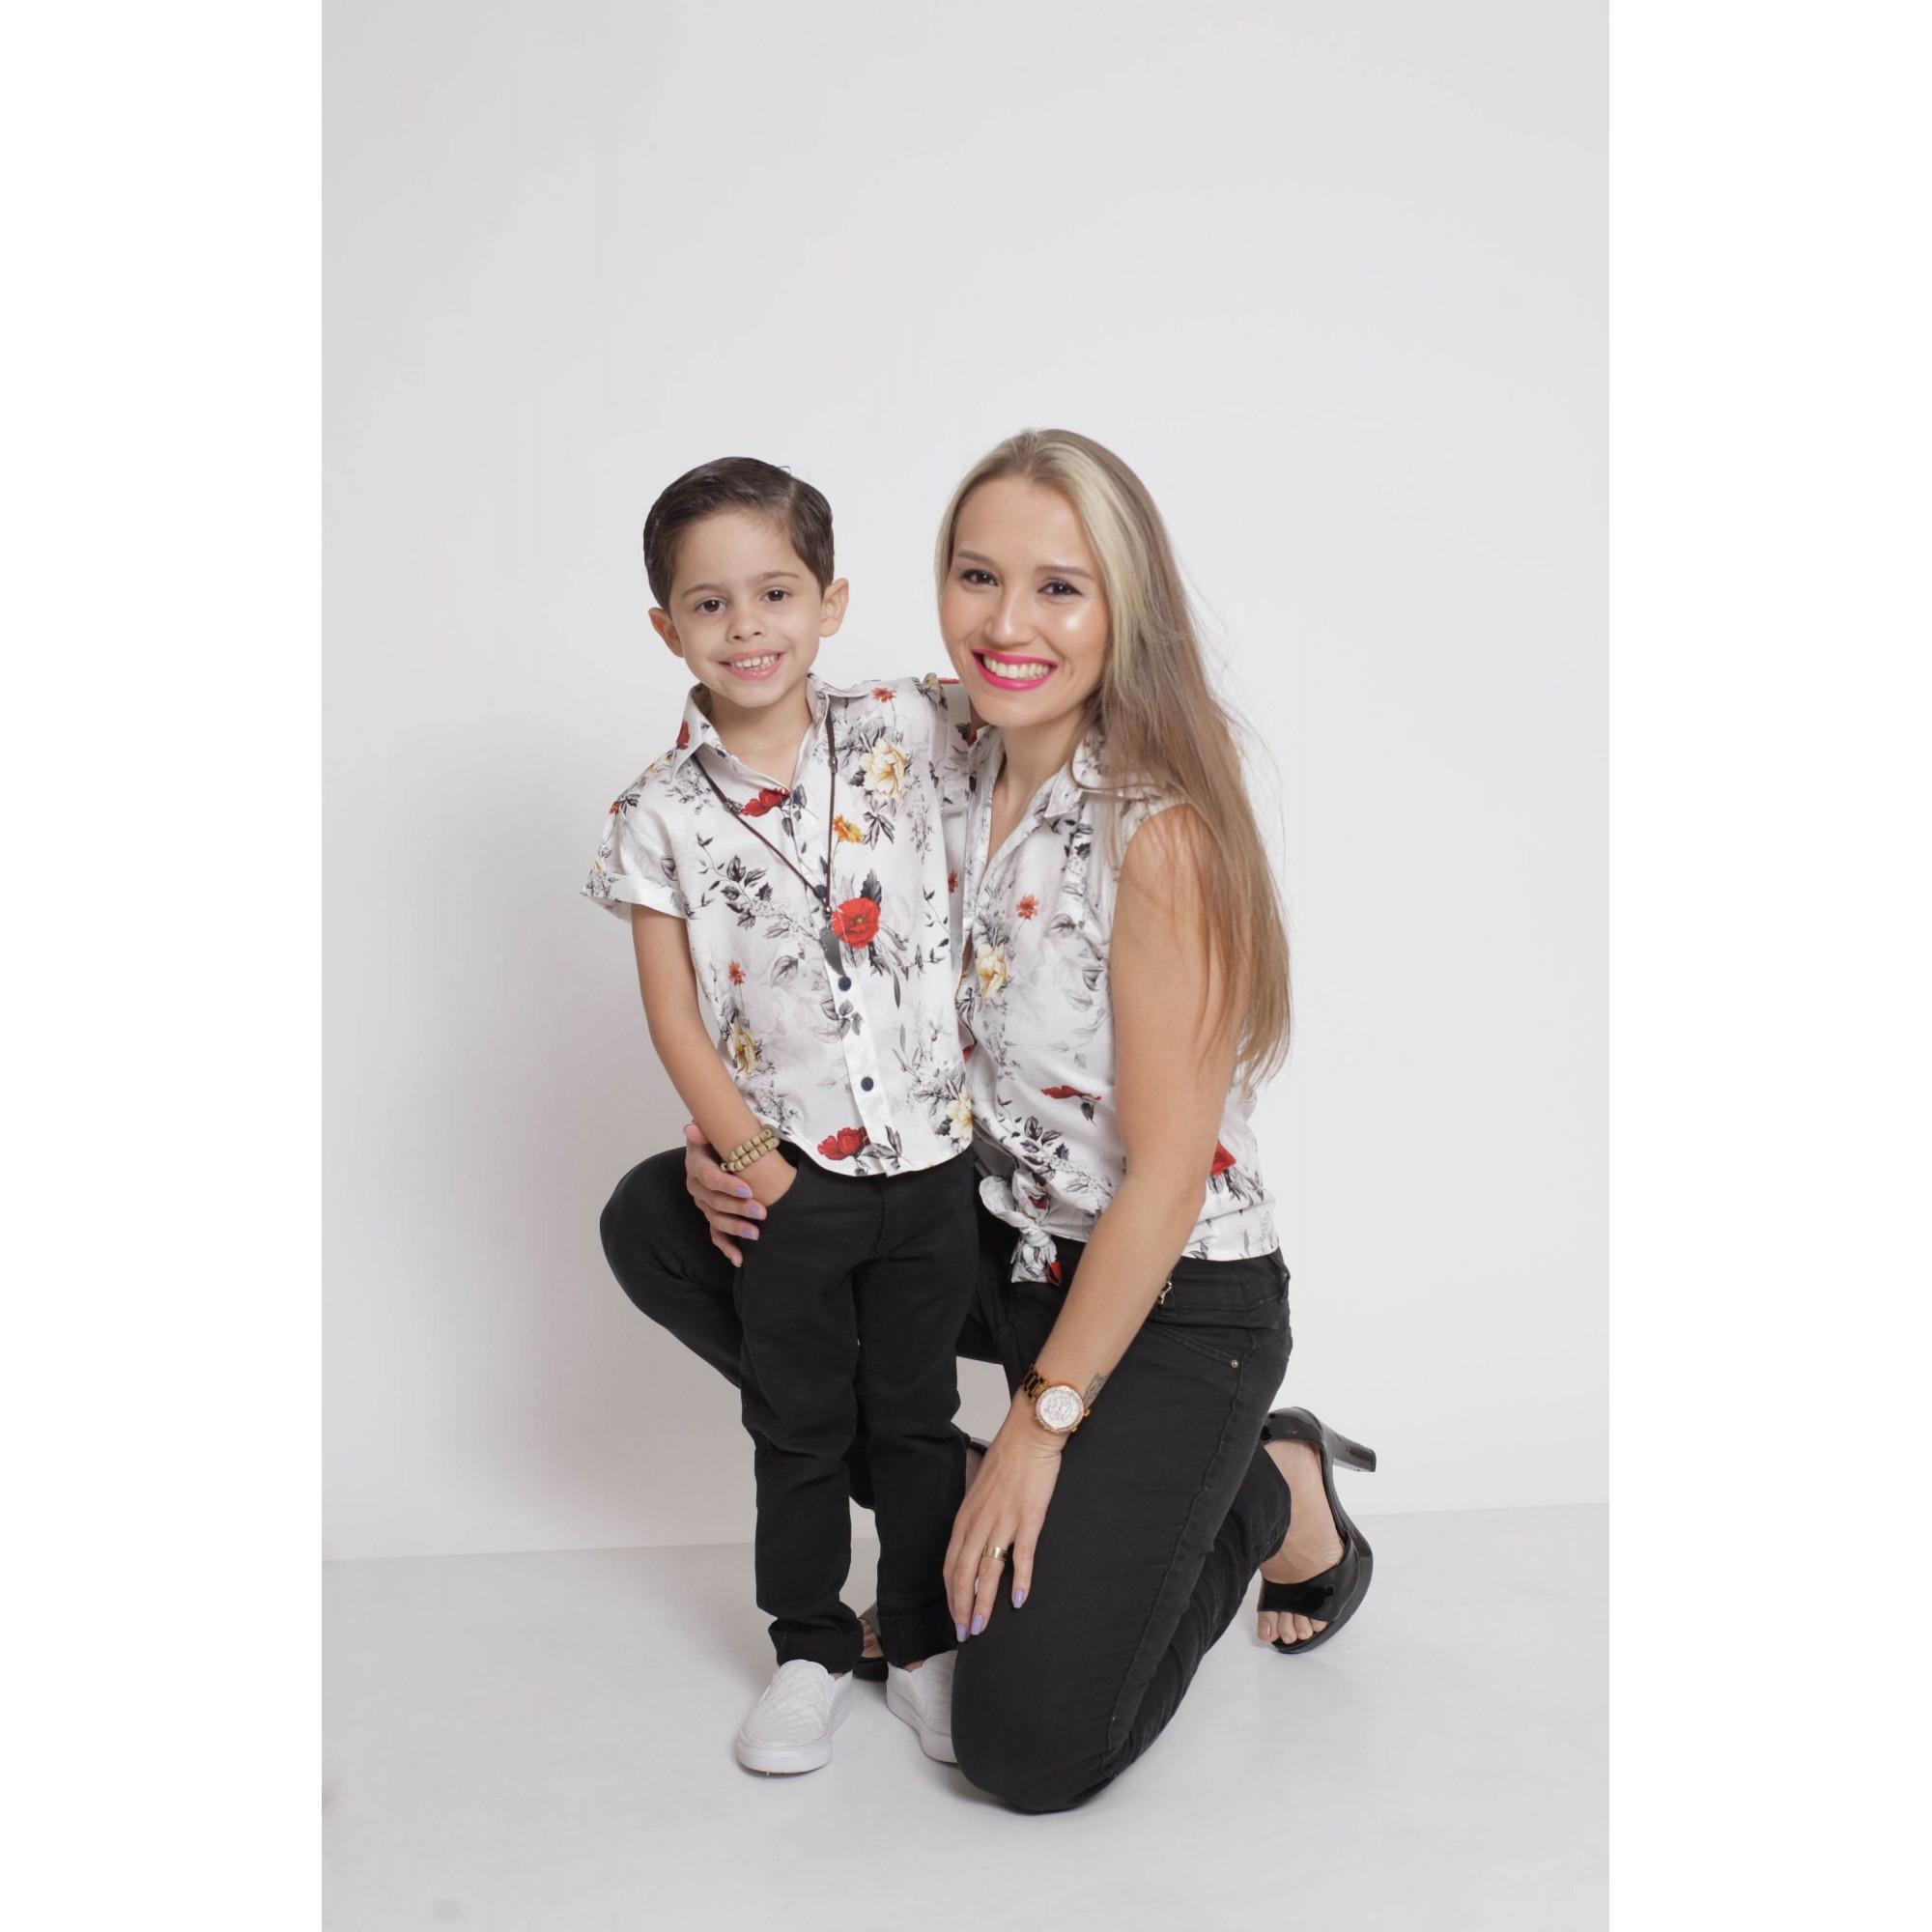 MÃE E FILHO > Kit 02 Camisas Social - Adulto + Infantil Branca Floral [Coleção Tal Mãe Tal Filho]  - Heitor Fashion Brazil